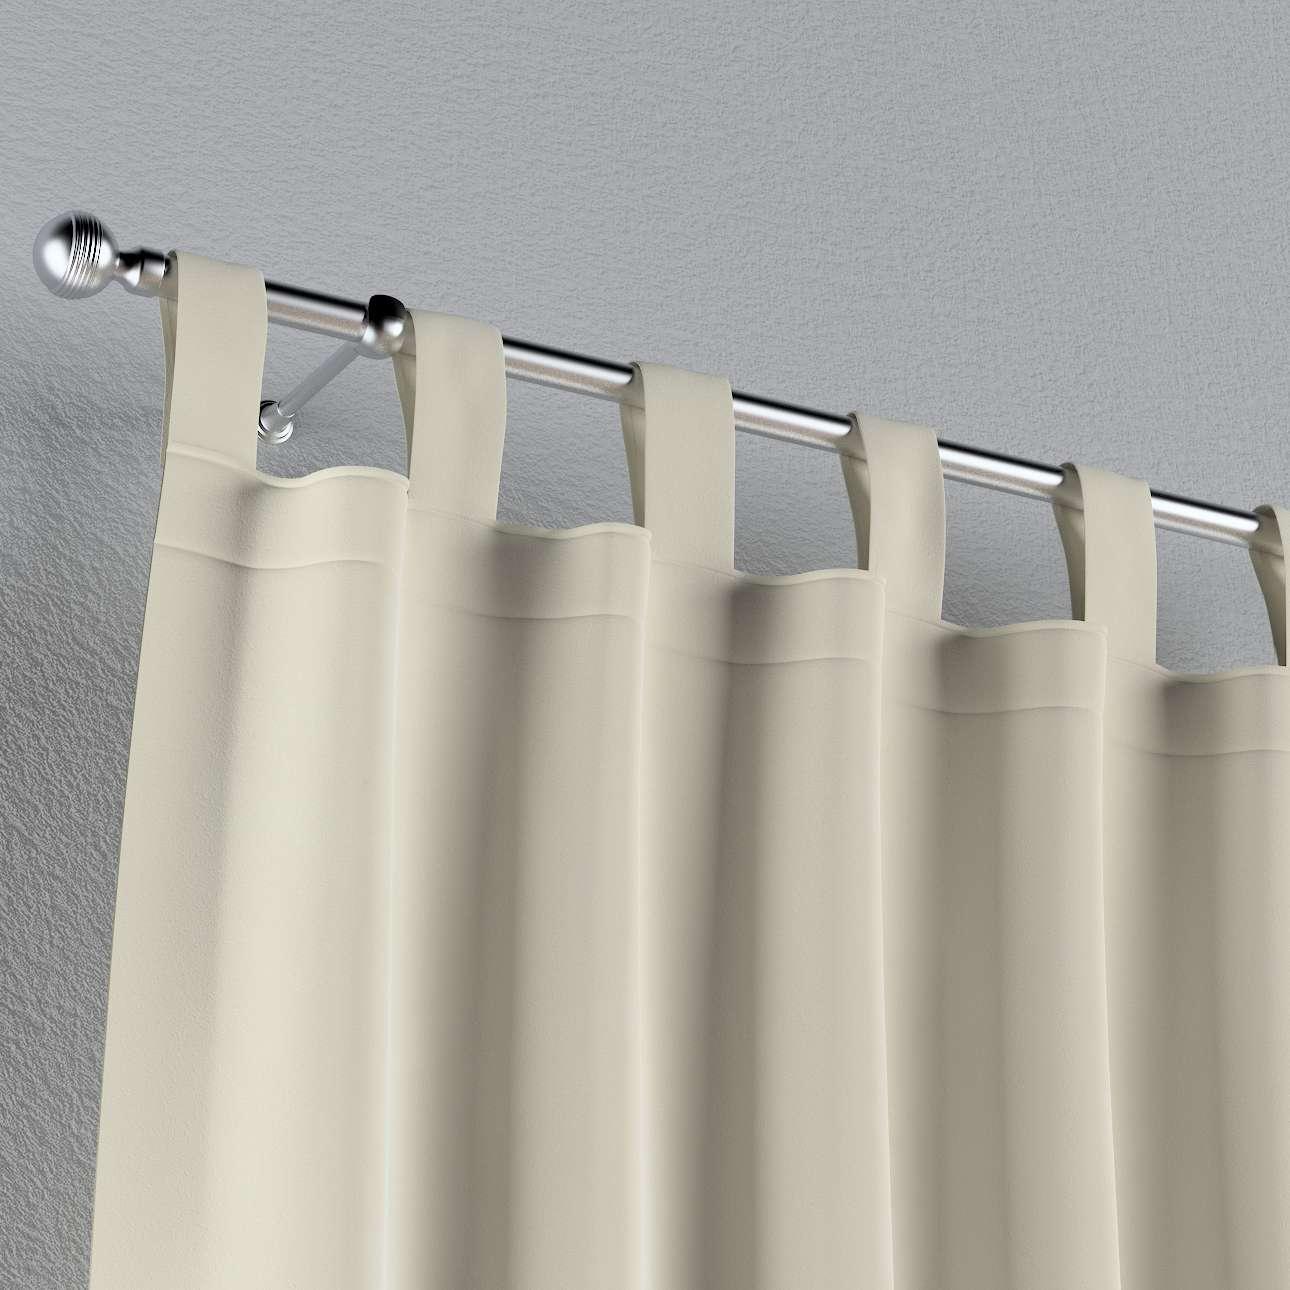 Záves na pútkach V kolekcii Velvet, tkanina: 704-10